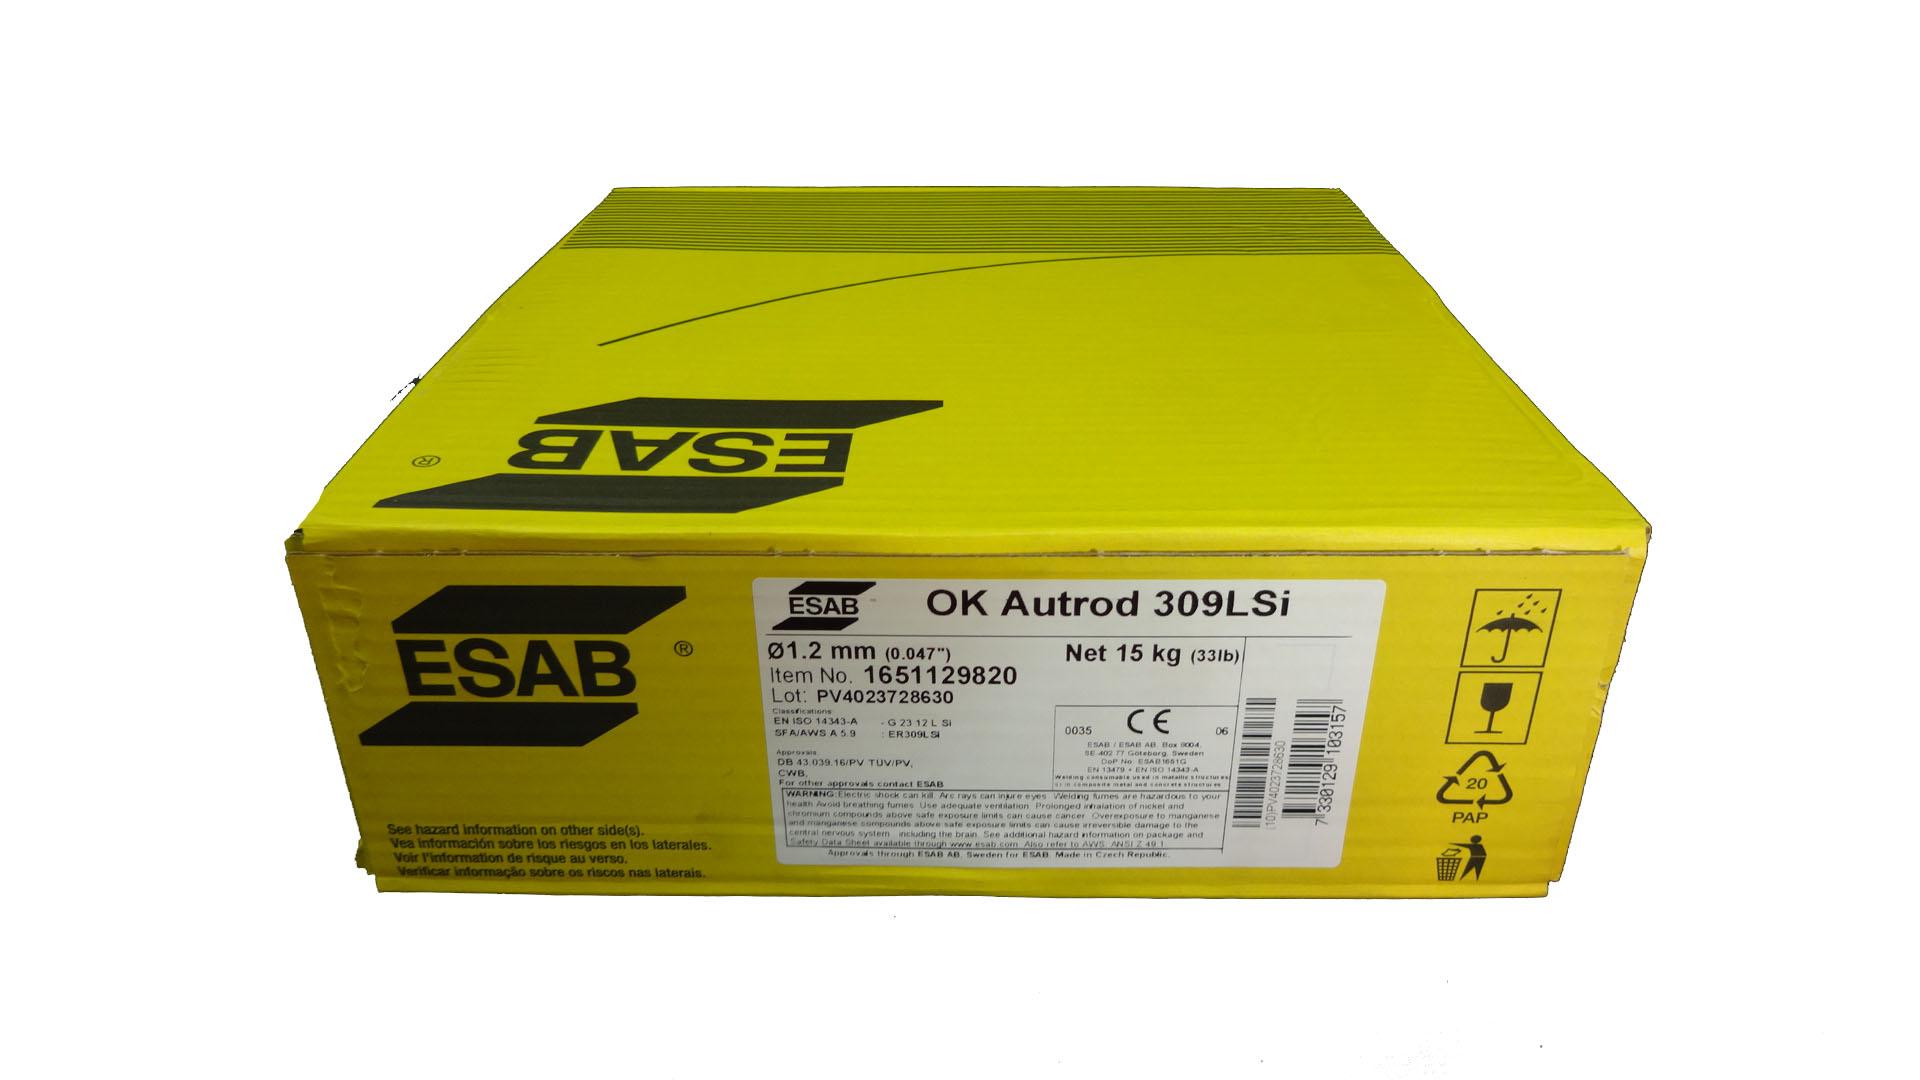 ESAB AUTROD 309LSI 12